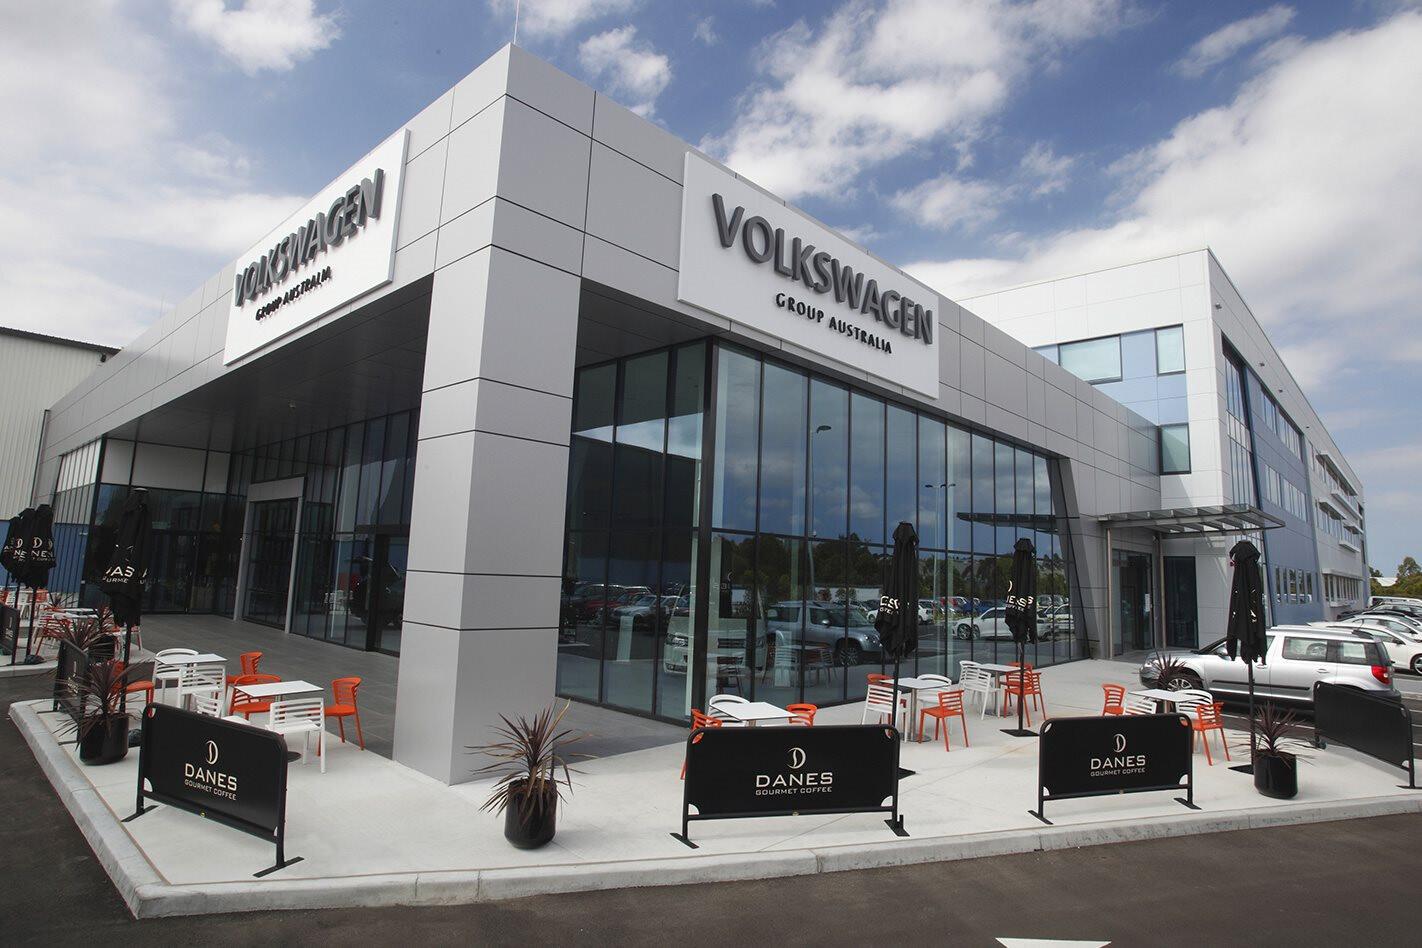 Dieselgate: Volkswagen Australia responds